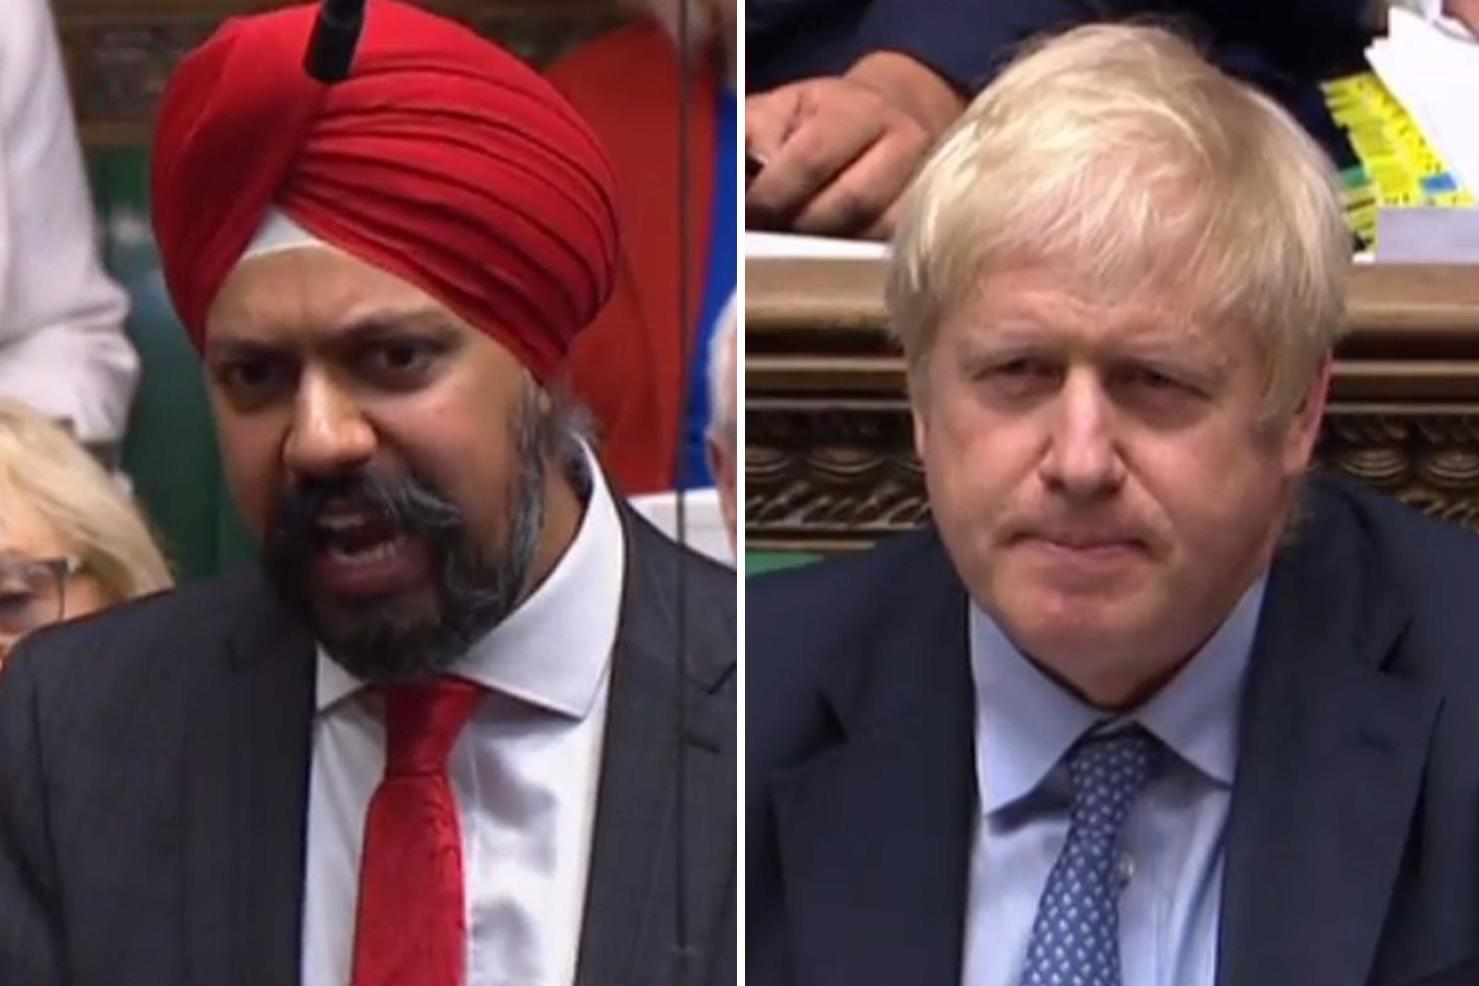 Tanmanjeet Singh Dheshi vs Boris Johnson